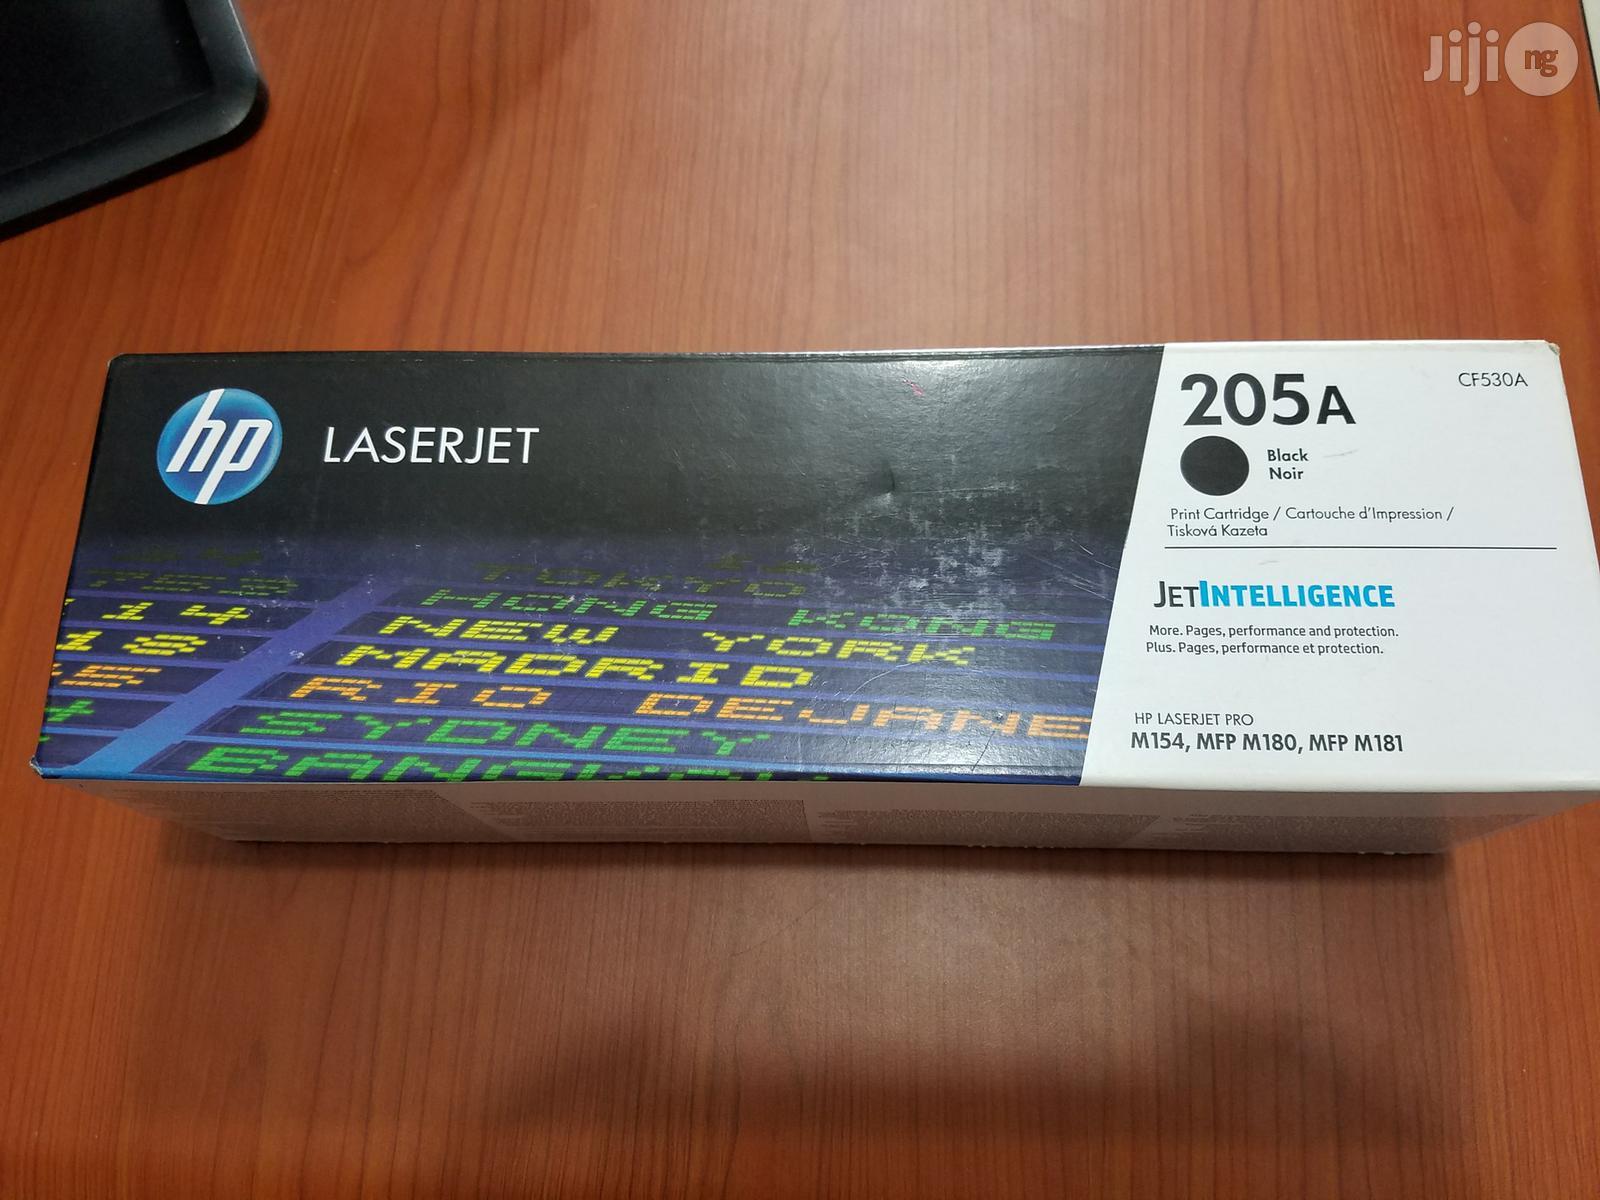 HP 205A Black Toner Cartridge